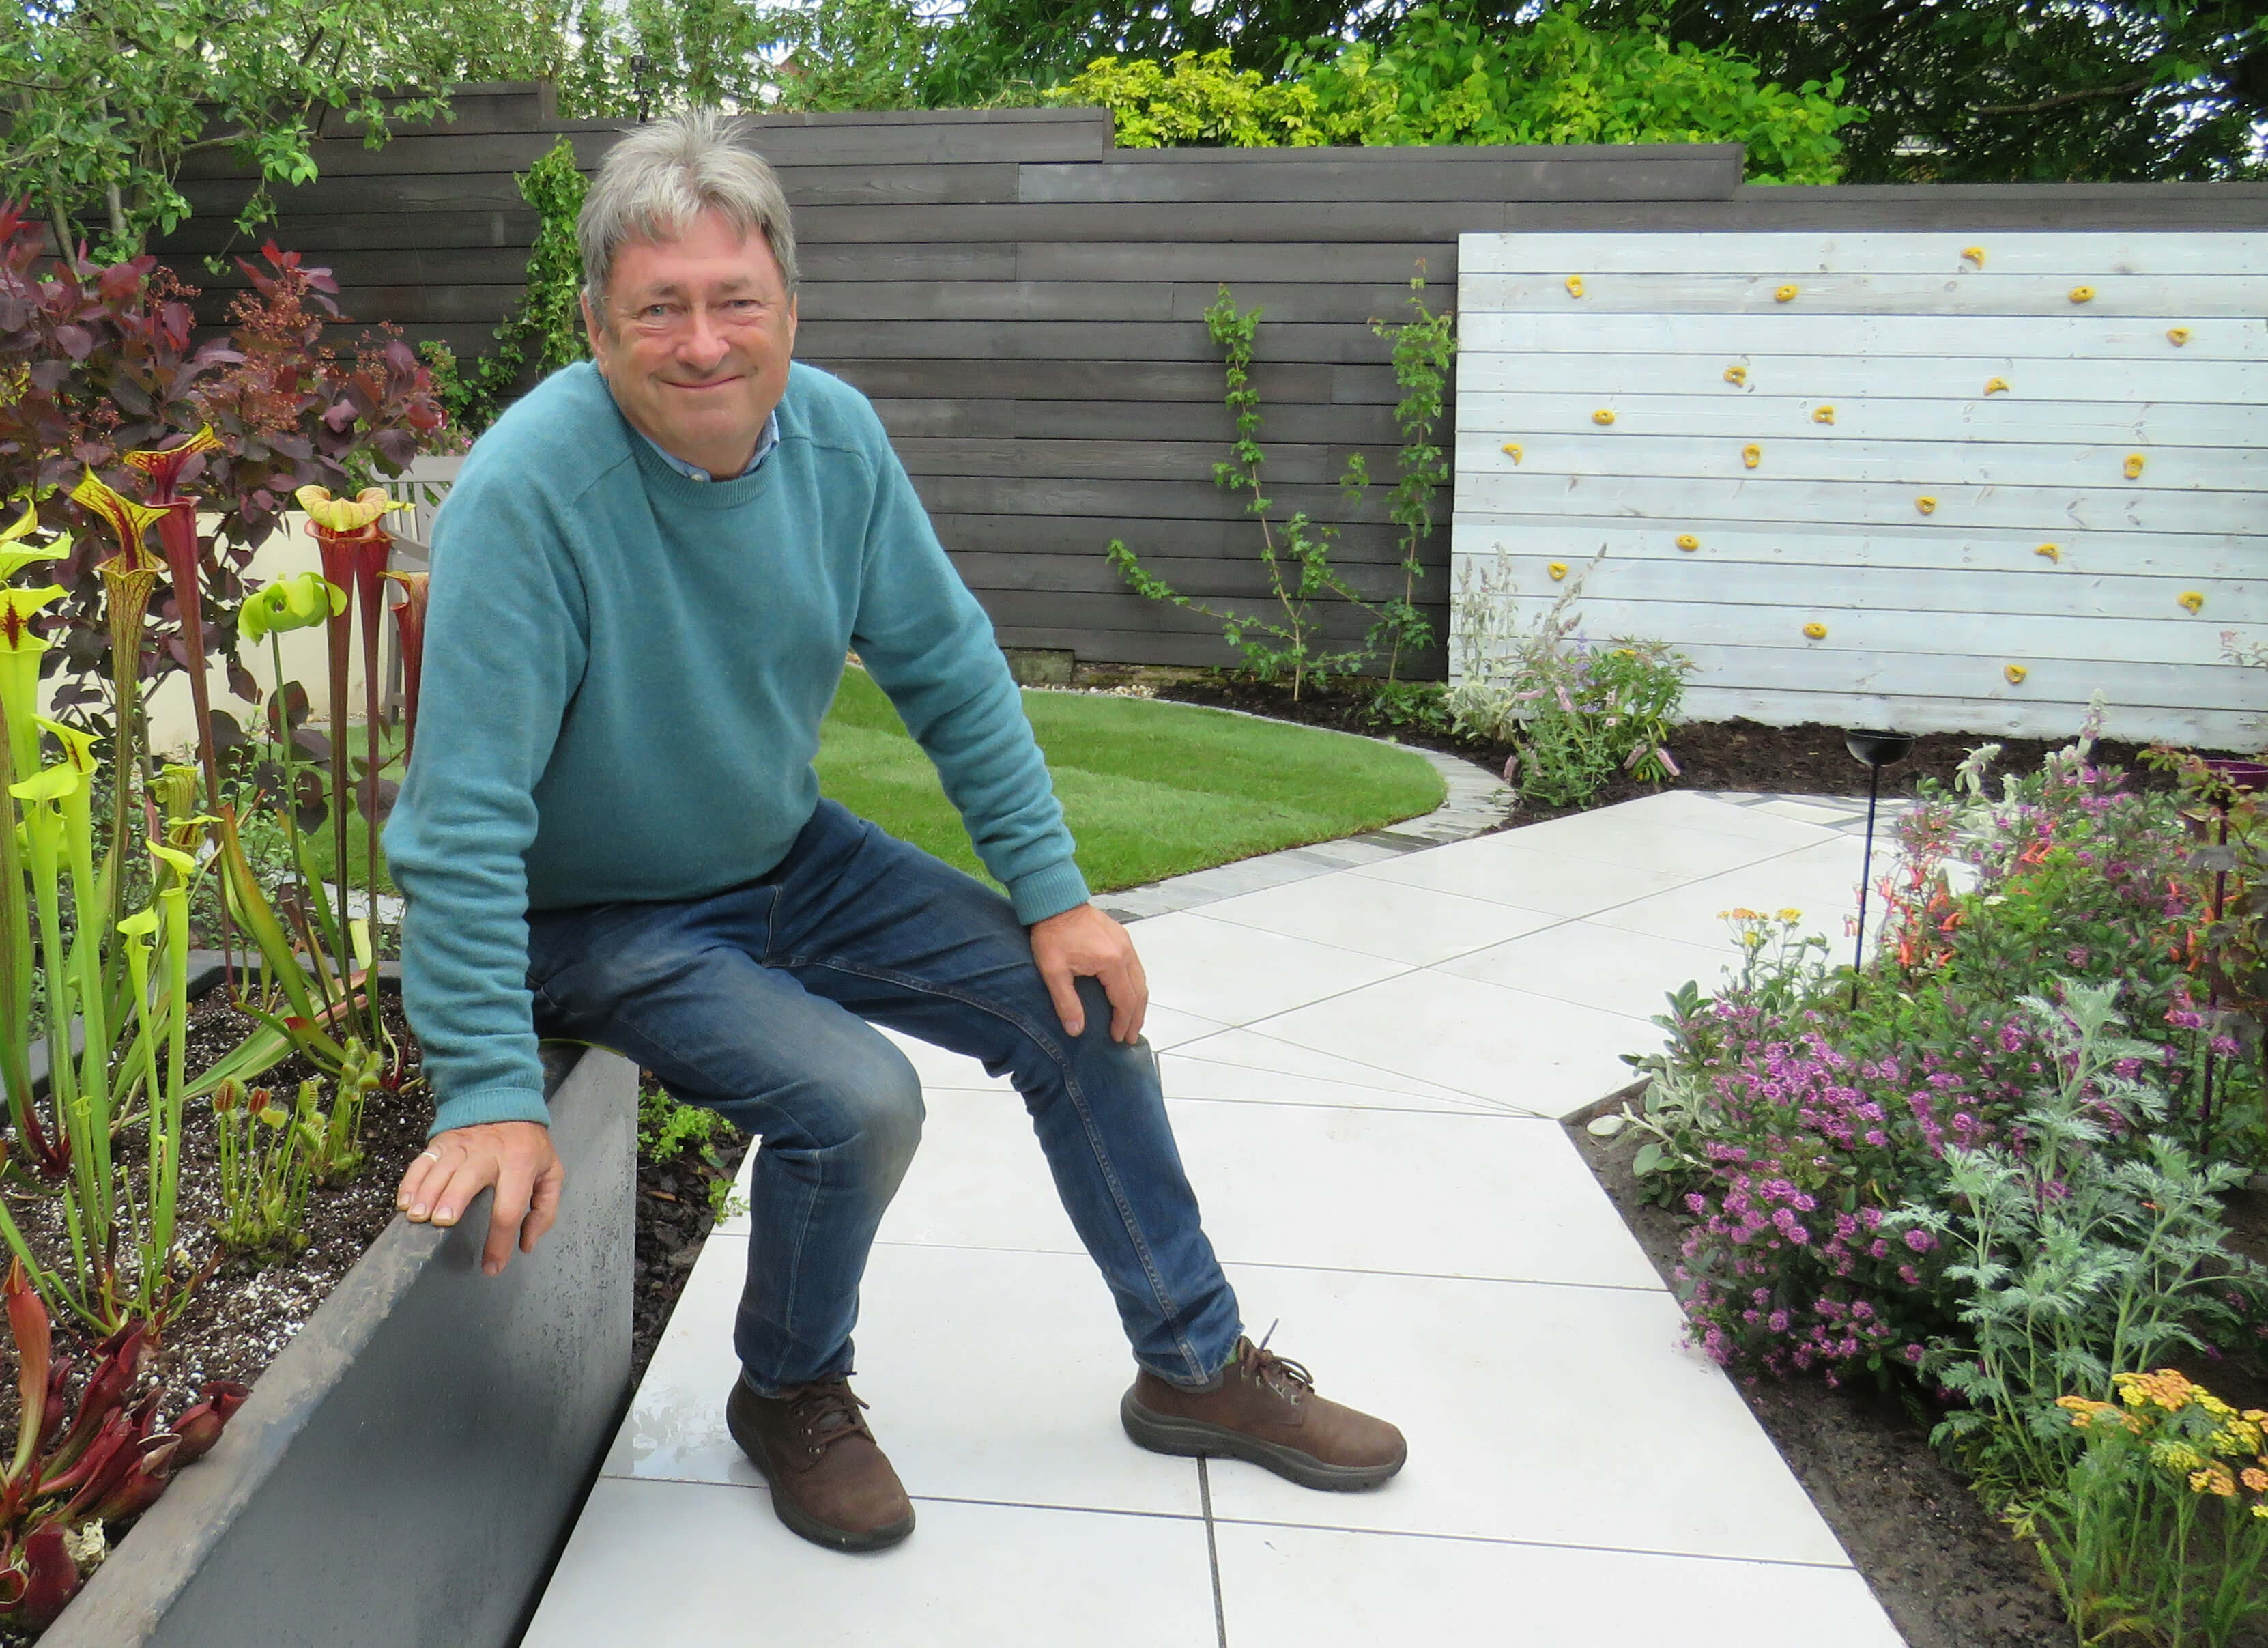 alan titchmarsh sat in a garden